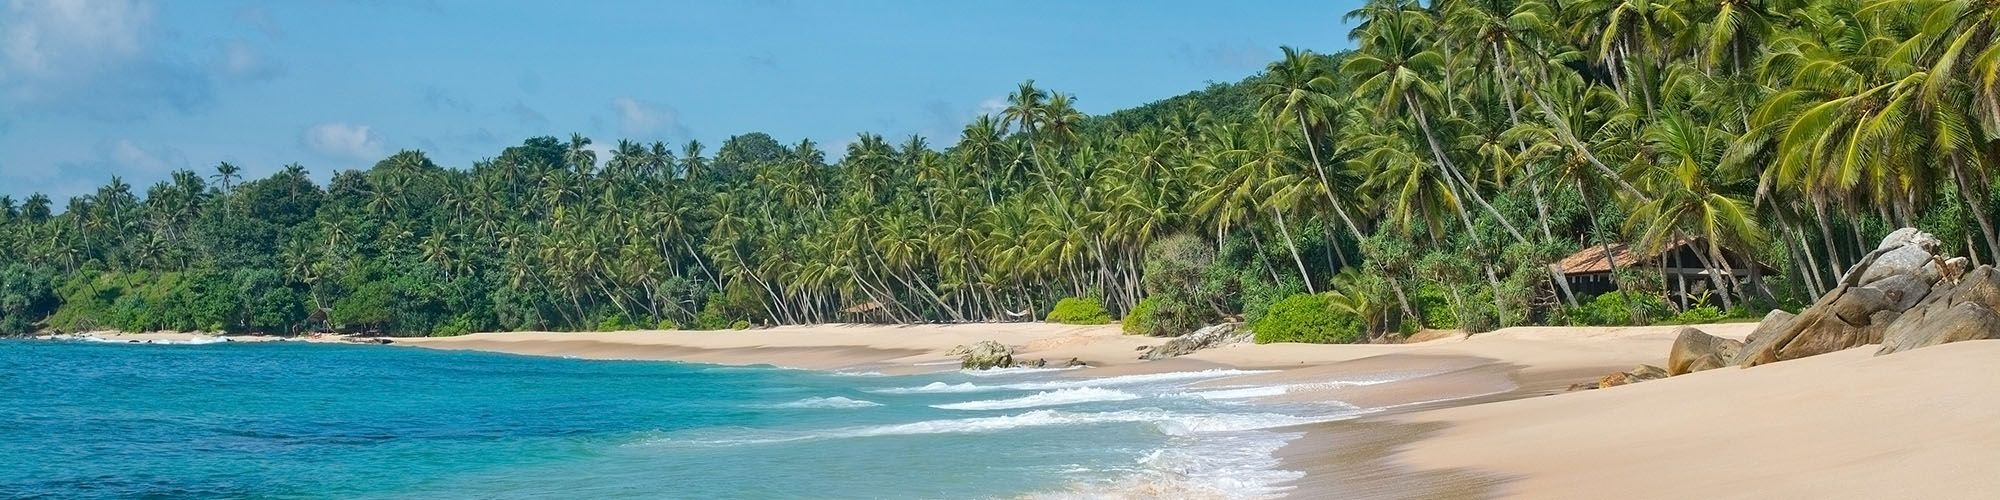 Sri Lanka, Süden, Strand, Bentota